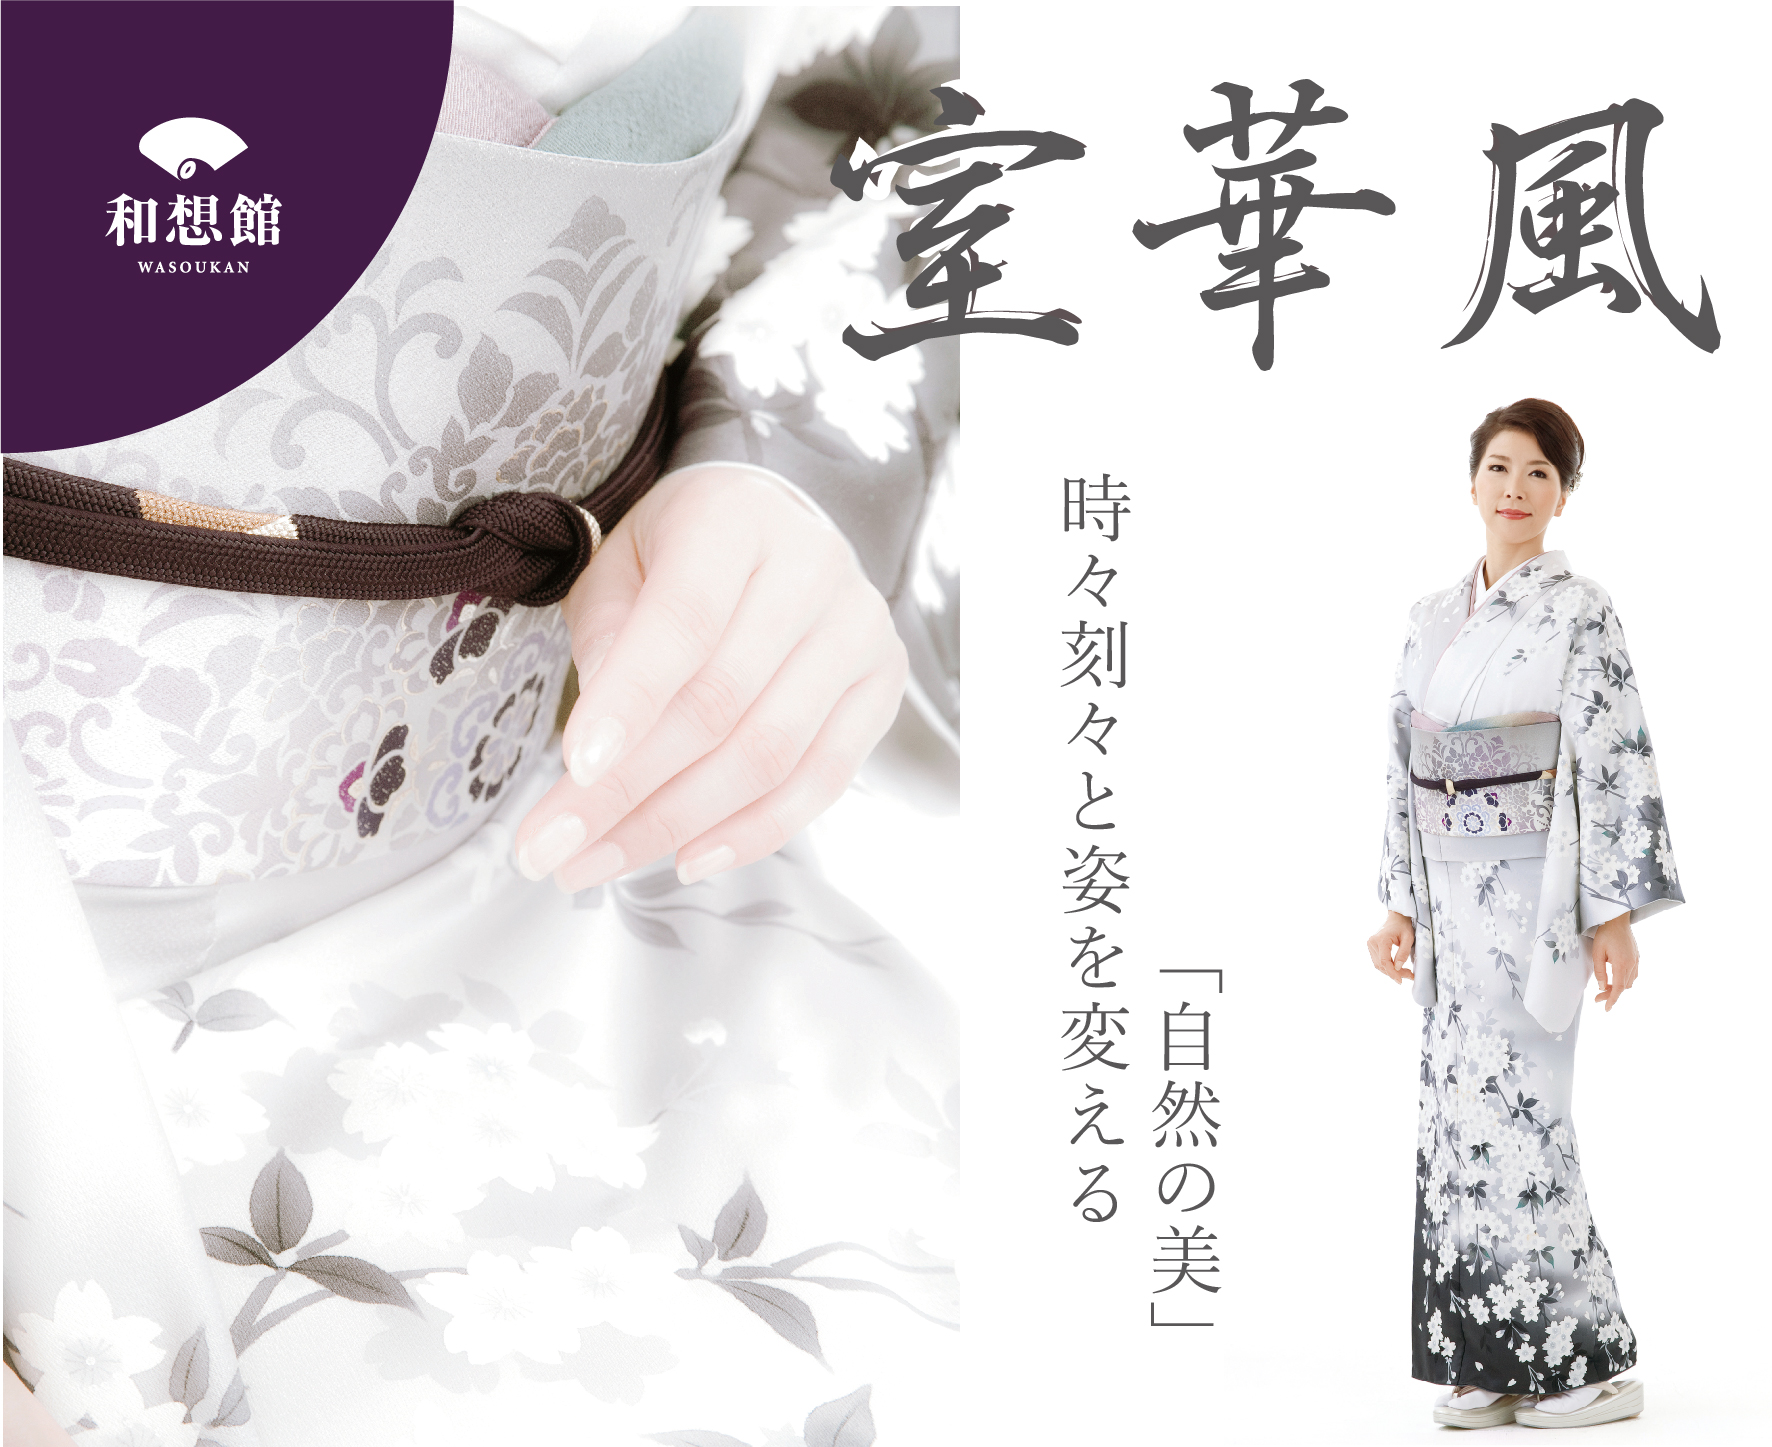 【徳山店】10月展示 室華風